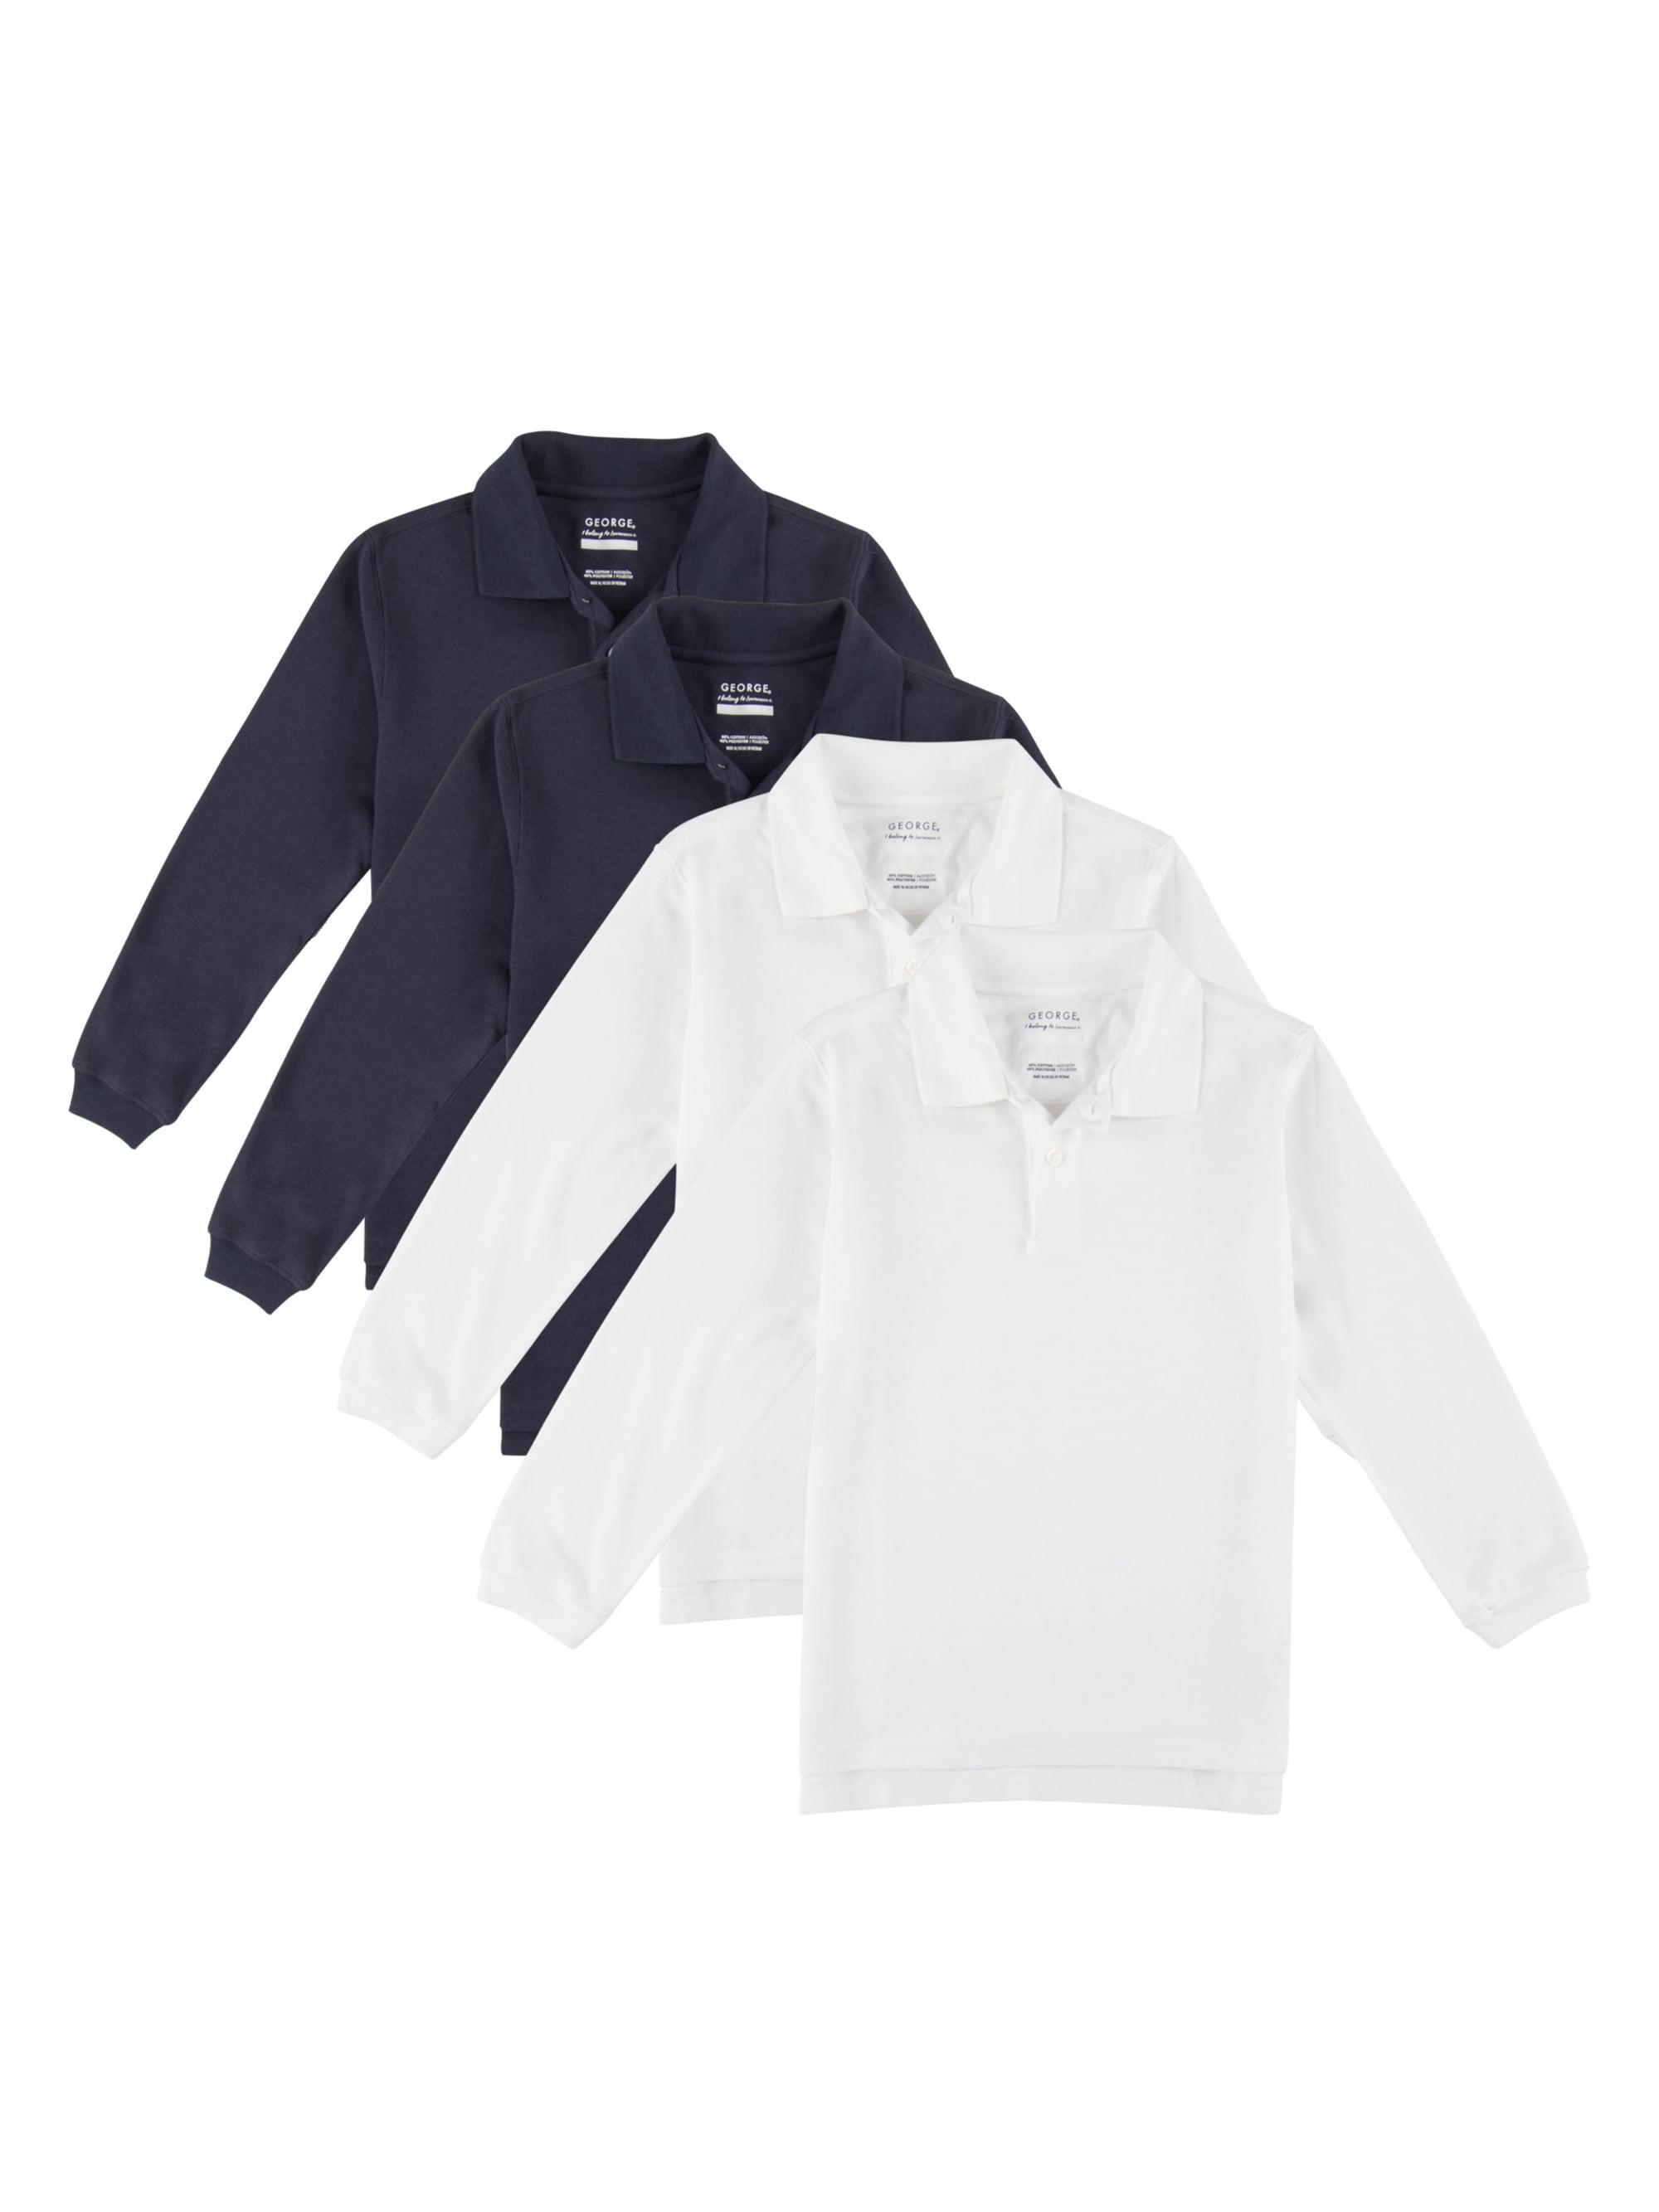 George Boys School Uniforms Long Sleeve Pique Polo Shirts 4 Pack